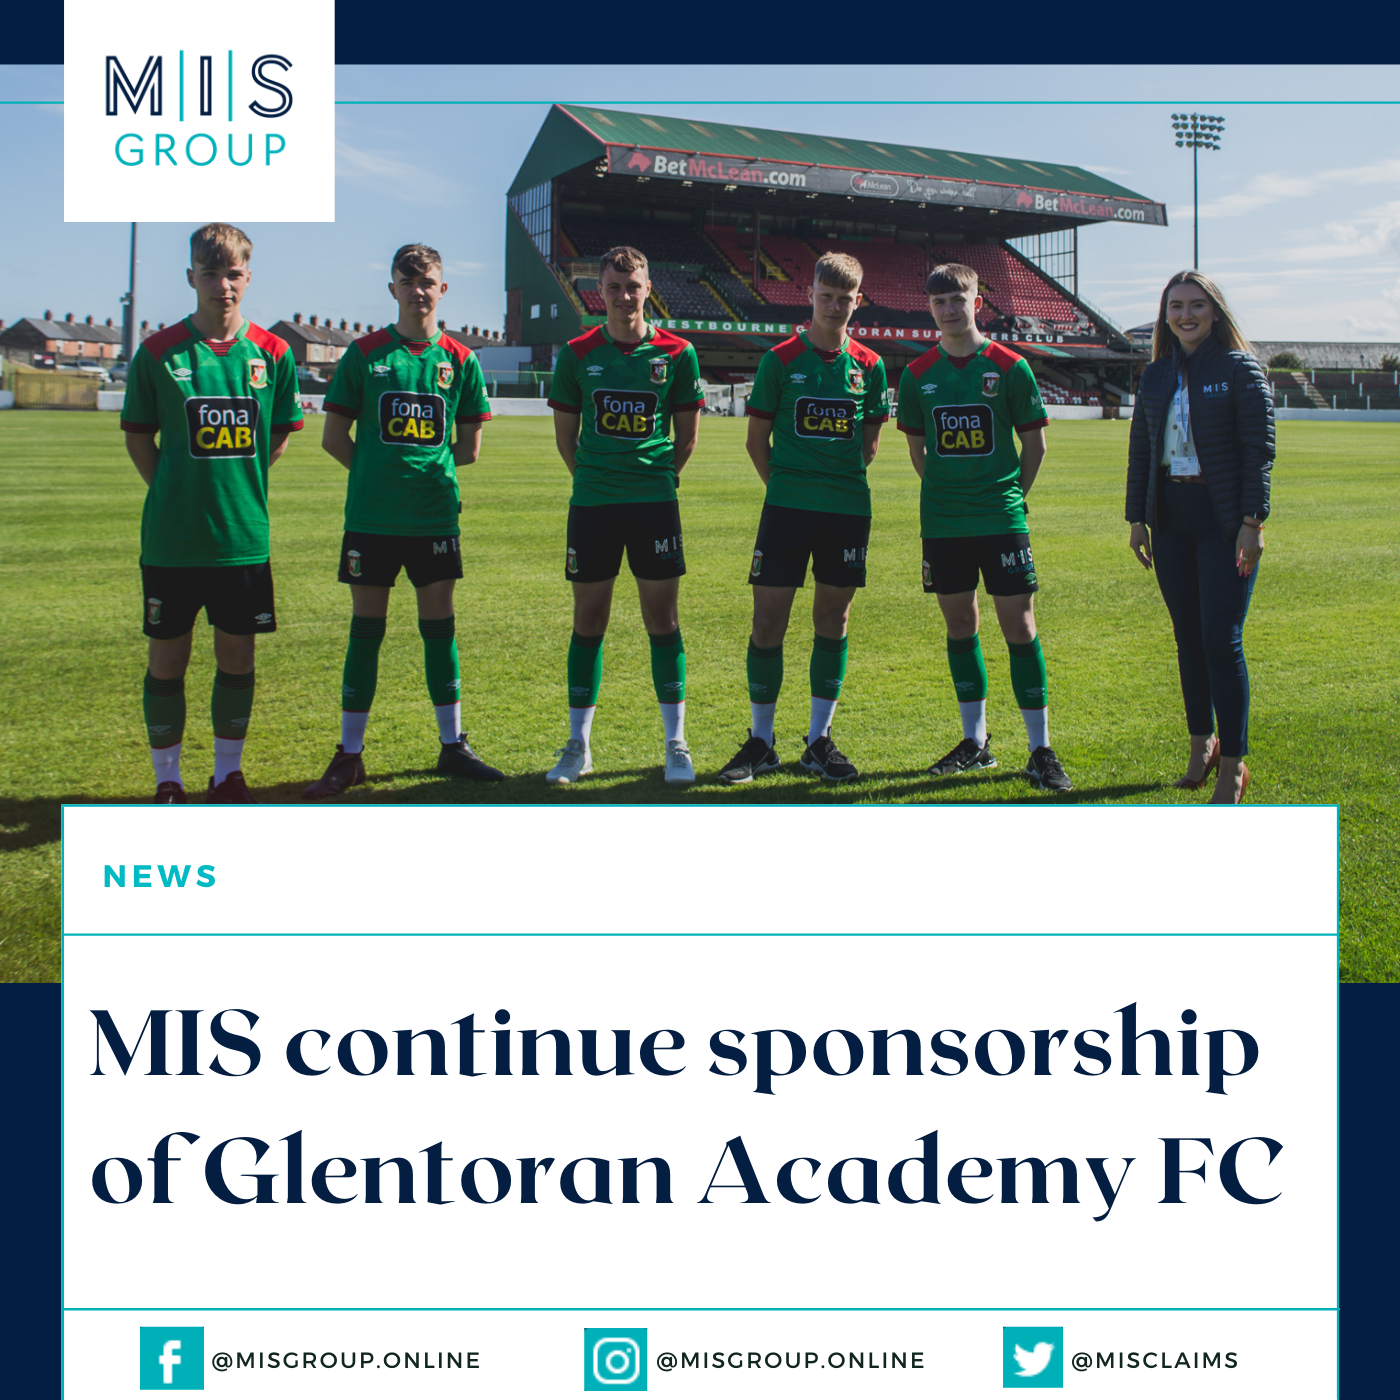 MIS continue sponsorship of Glentoran Academy FC